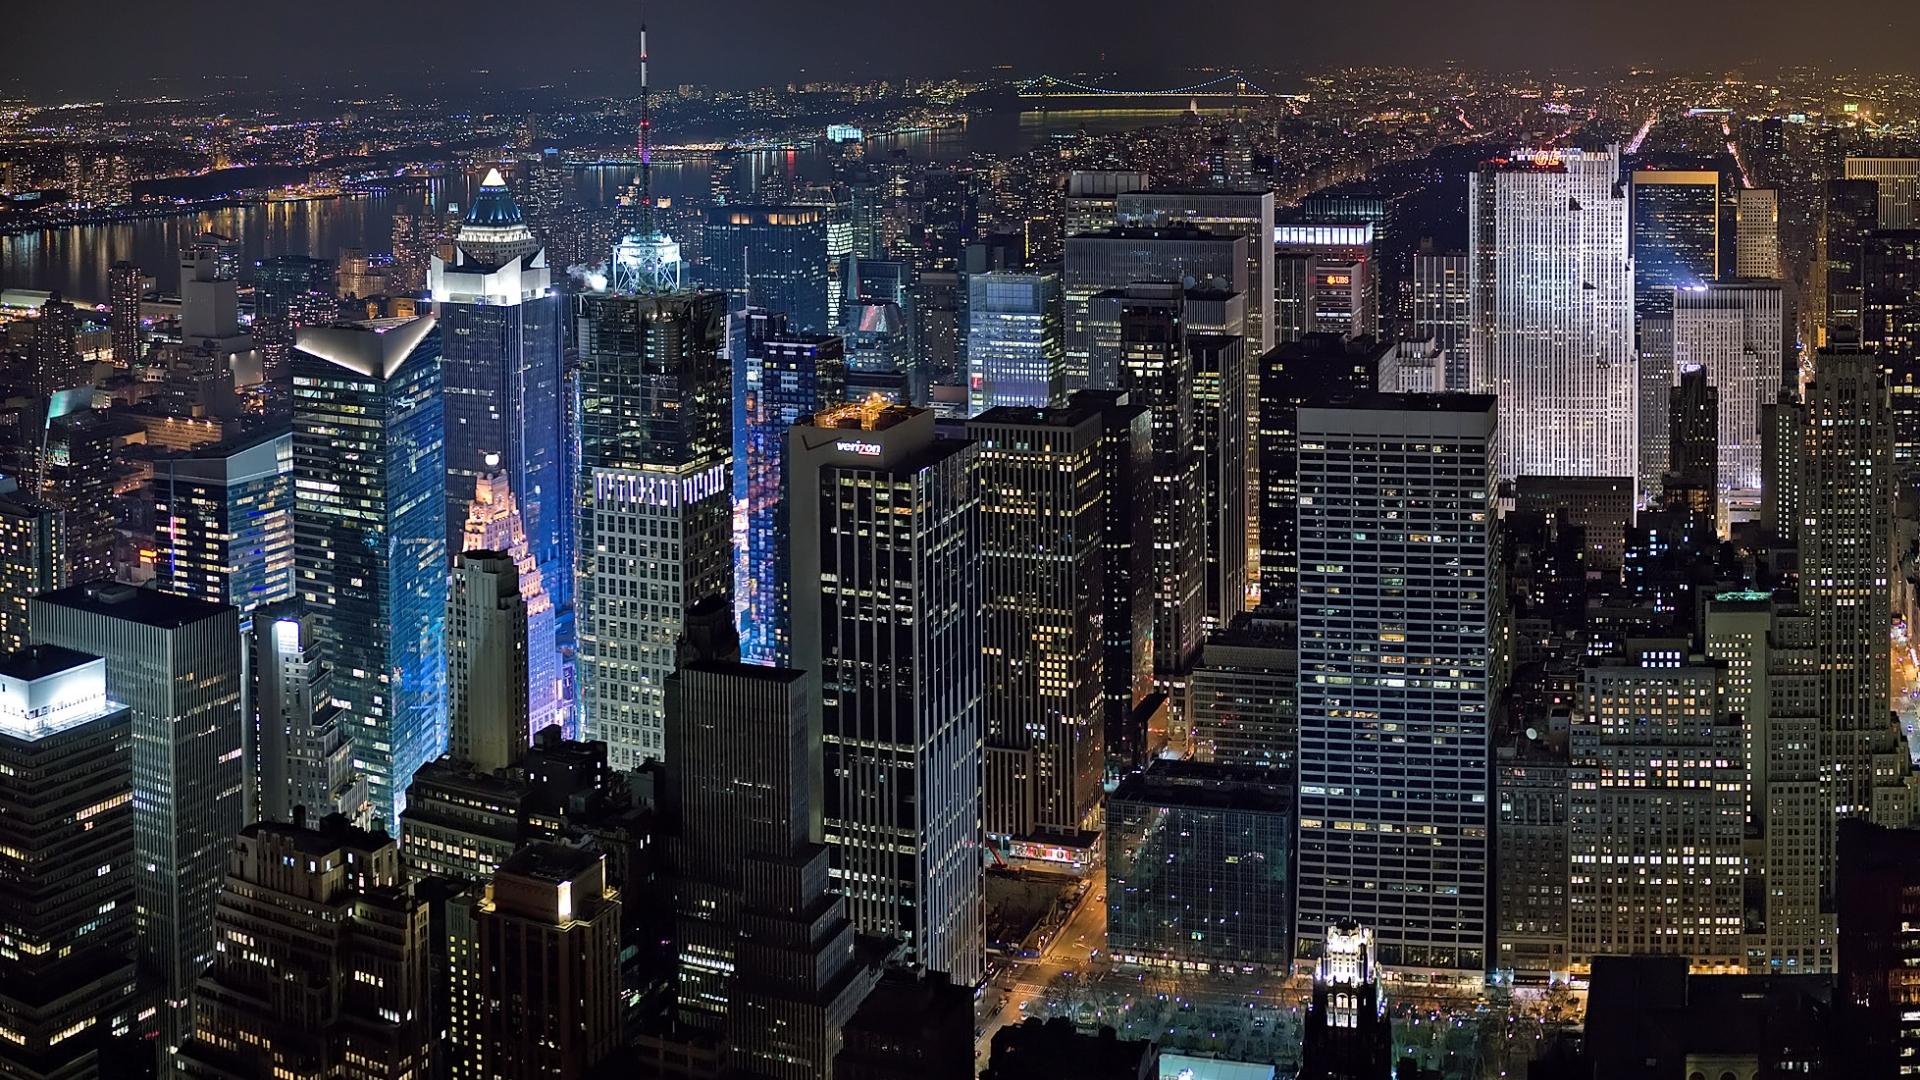 New York City at night Wallpaper 3682 1920x1080